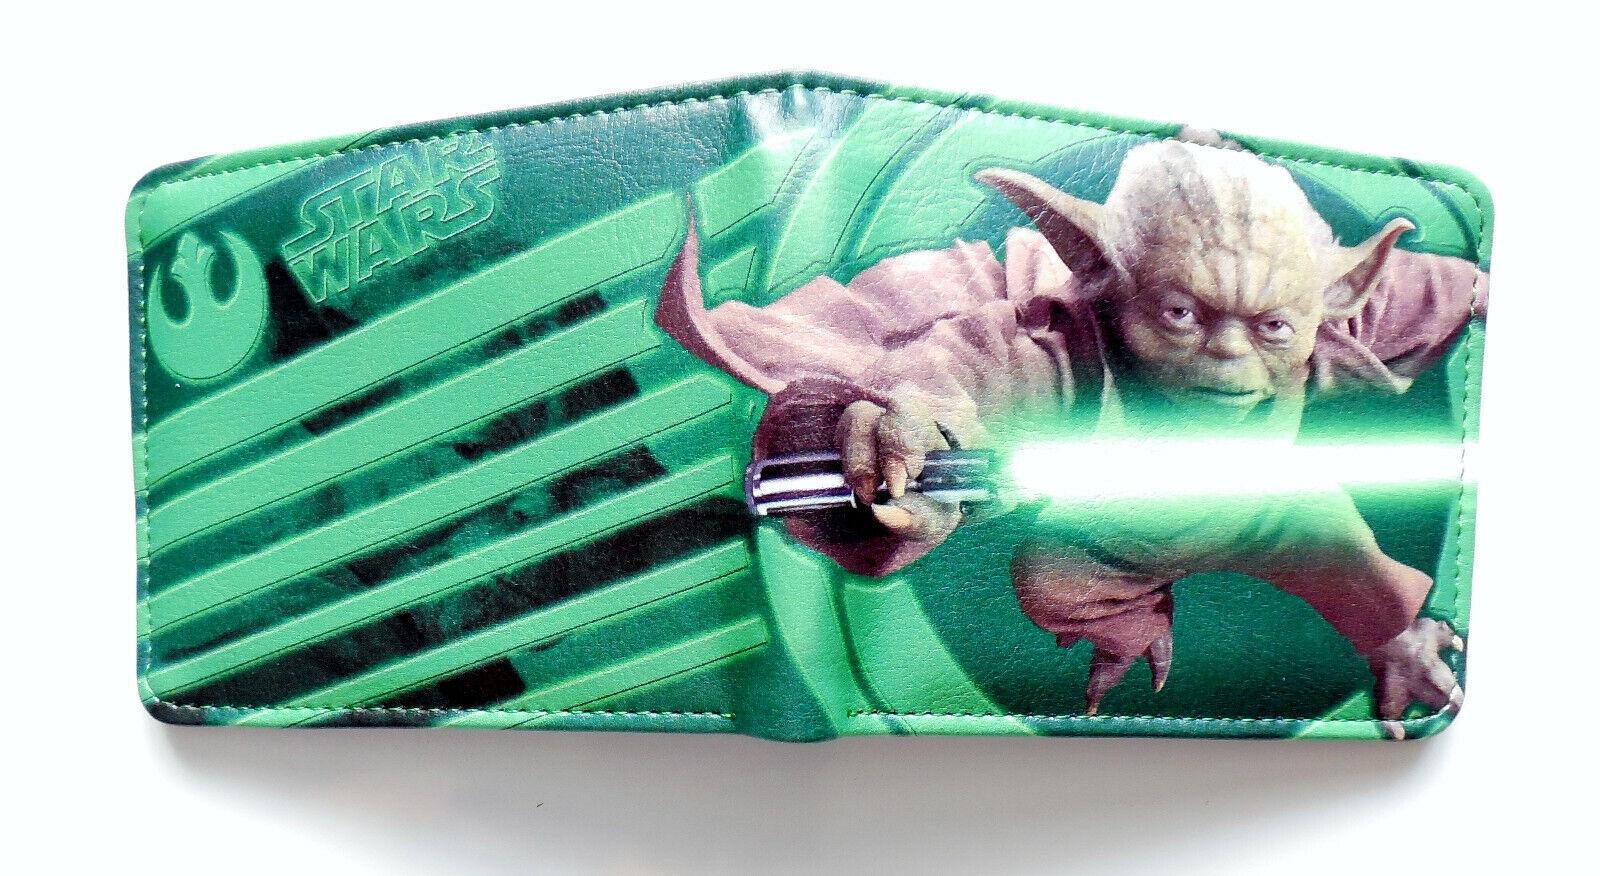 Yoda LightSaber Star Wars Wallet with id window Credit card slots zipped pocket